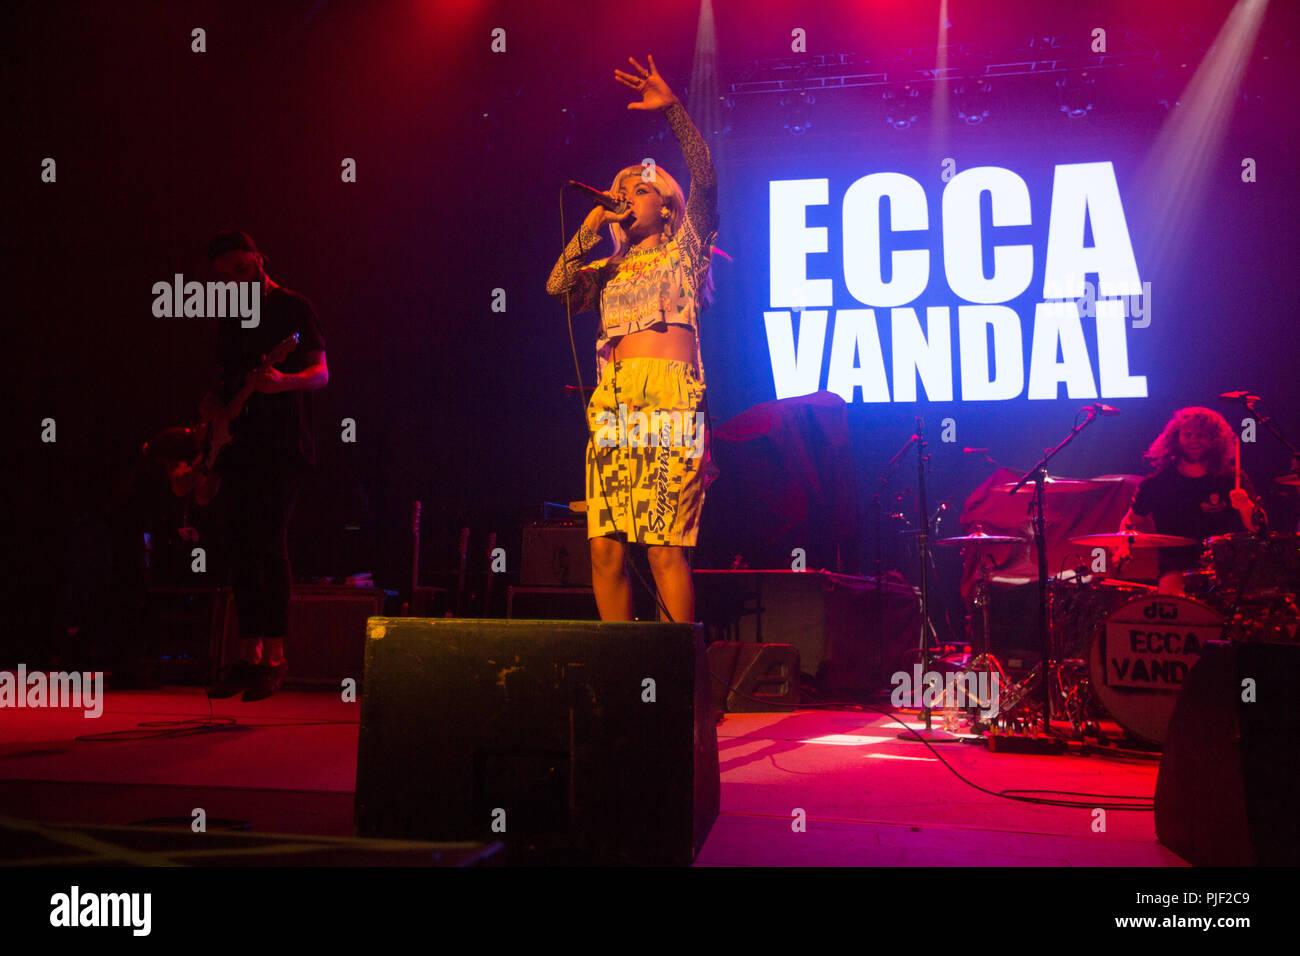 London, UK. 6th September, 2018. 06/9/2018 - Ecca Vandal Supports Incubus tour  at Brixton Academy London UK  -   Mandatory Credit Glamourstock Credit: glamourstock/Alamy Live News Stock Photo